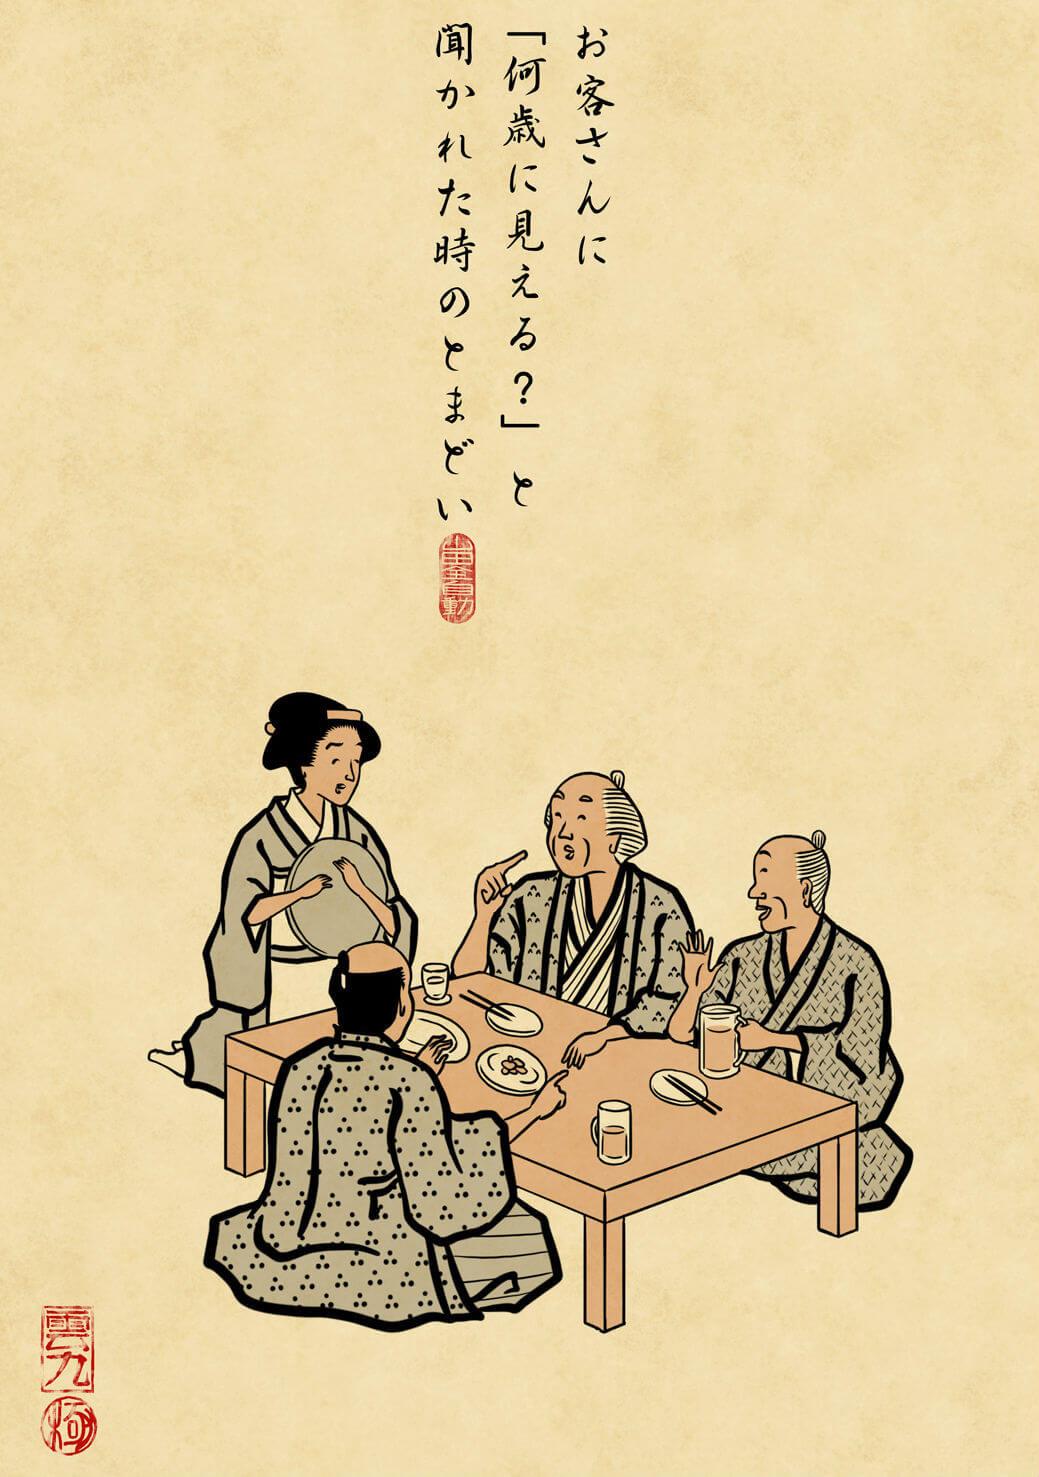 山田全自動の画像 p1_29